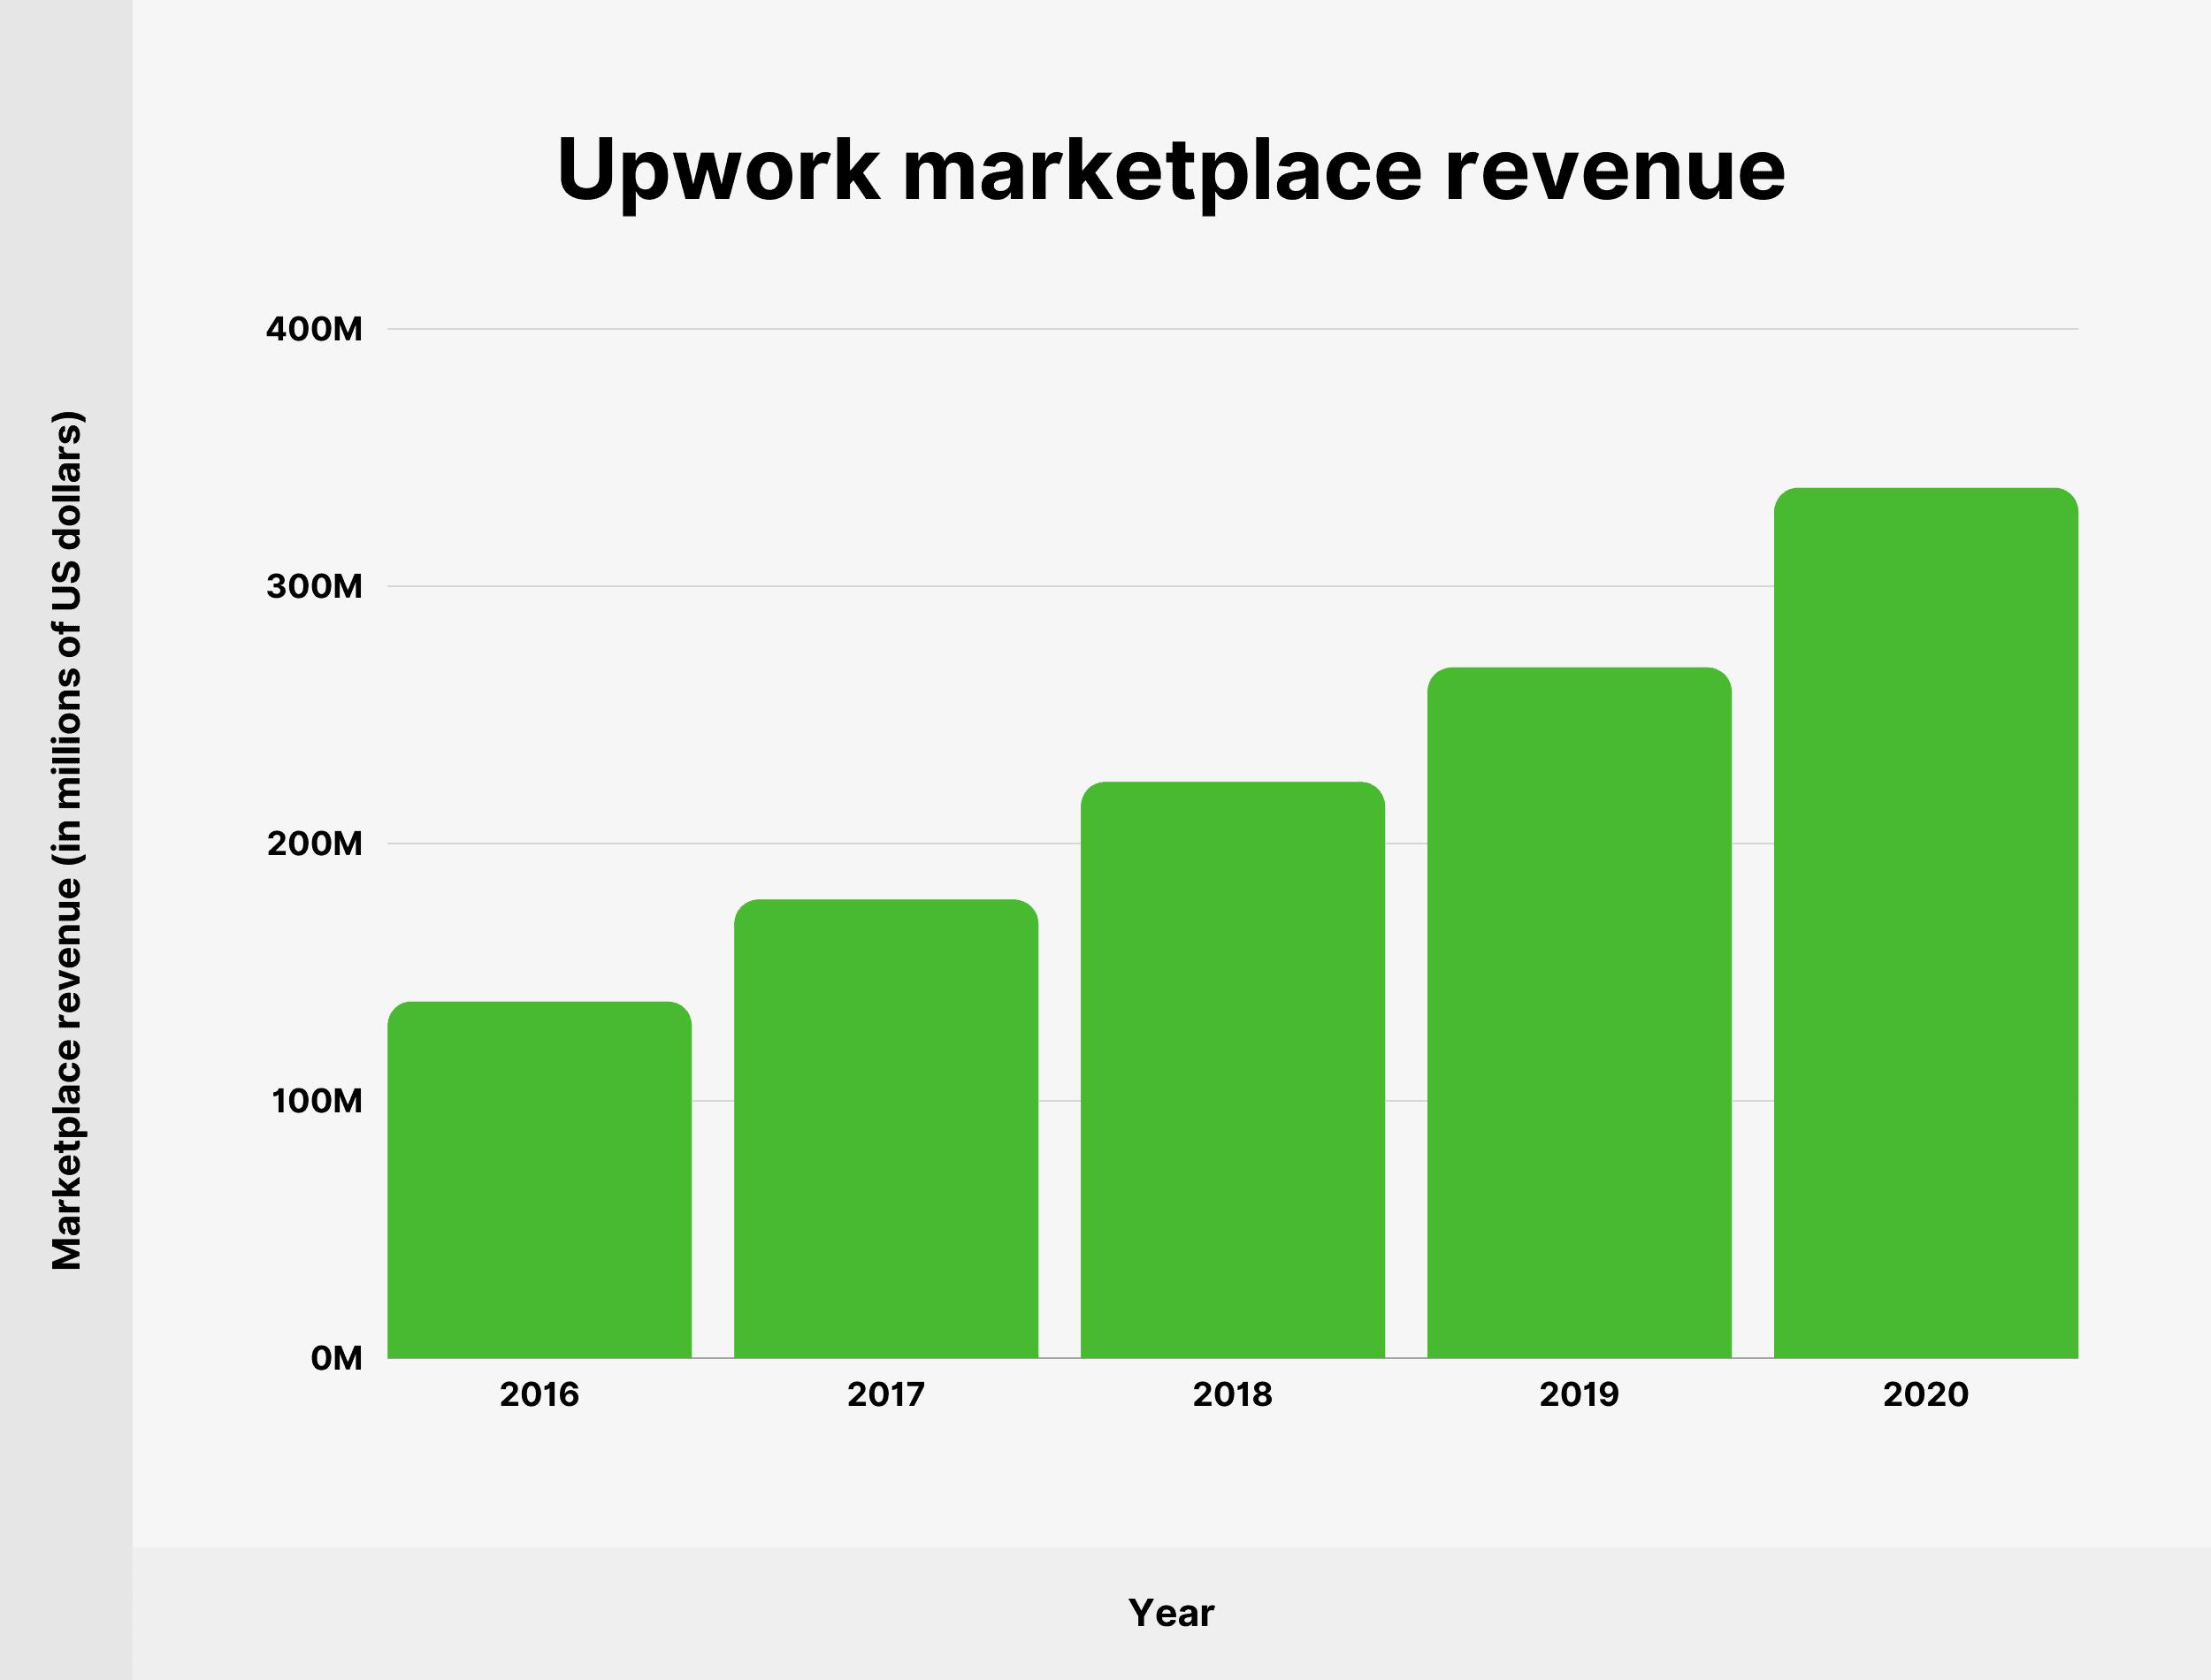 Upwork marketplace revenue